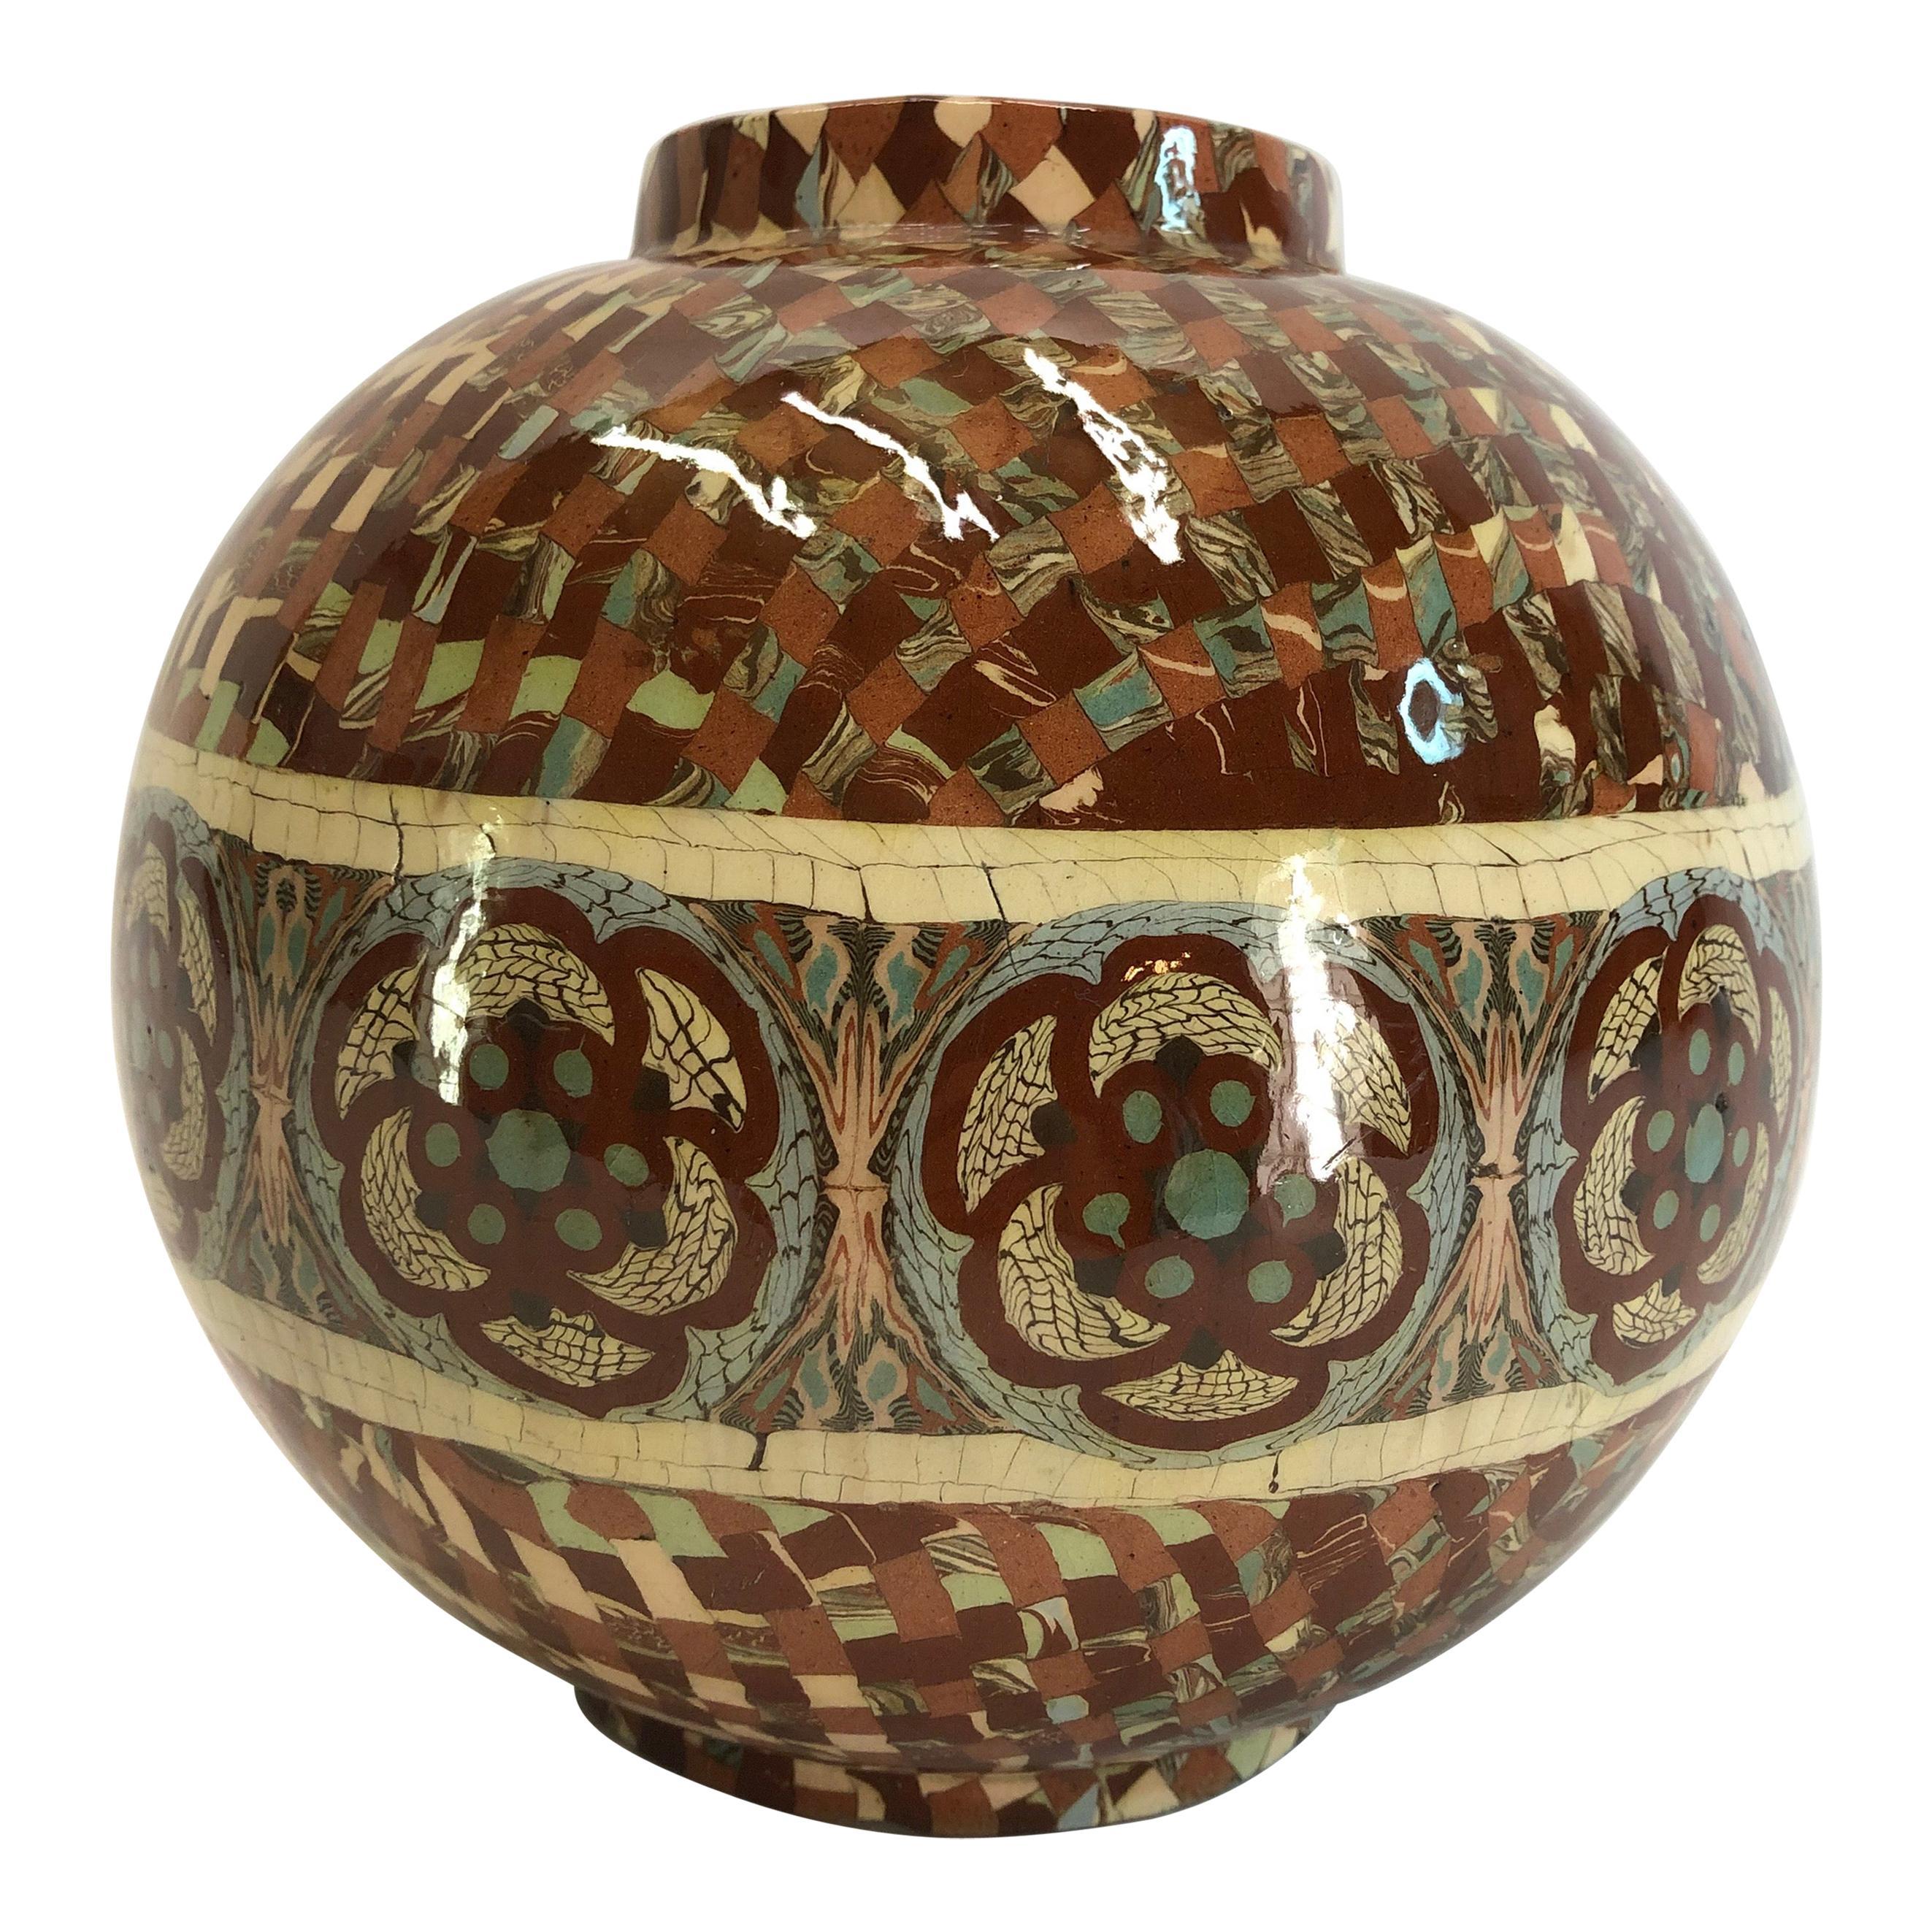 Jean Gerbino Ball Vase Ceramic Mêlée, Vallauris